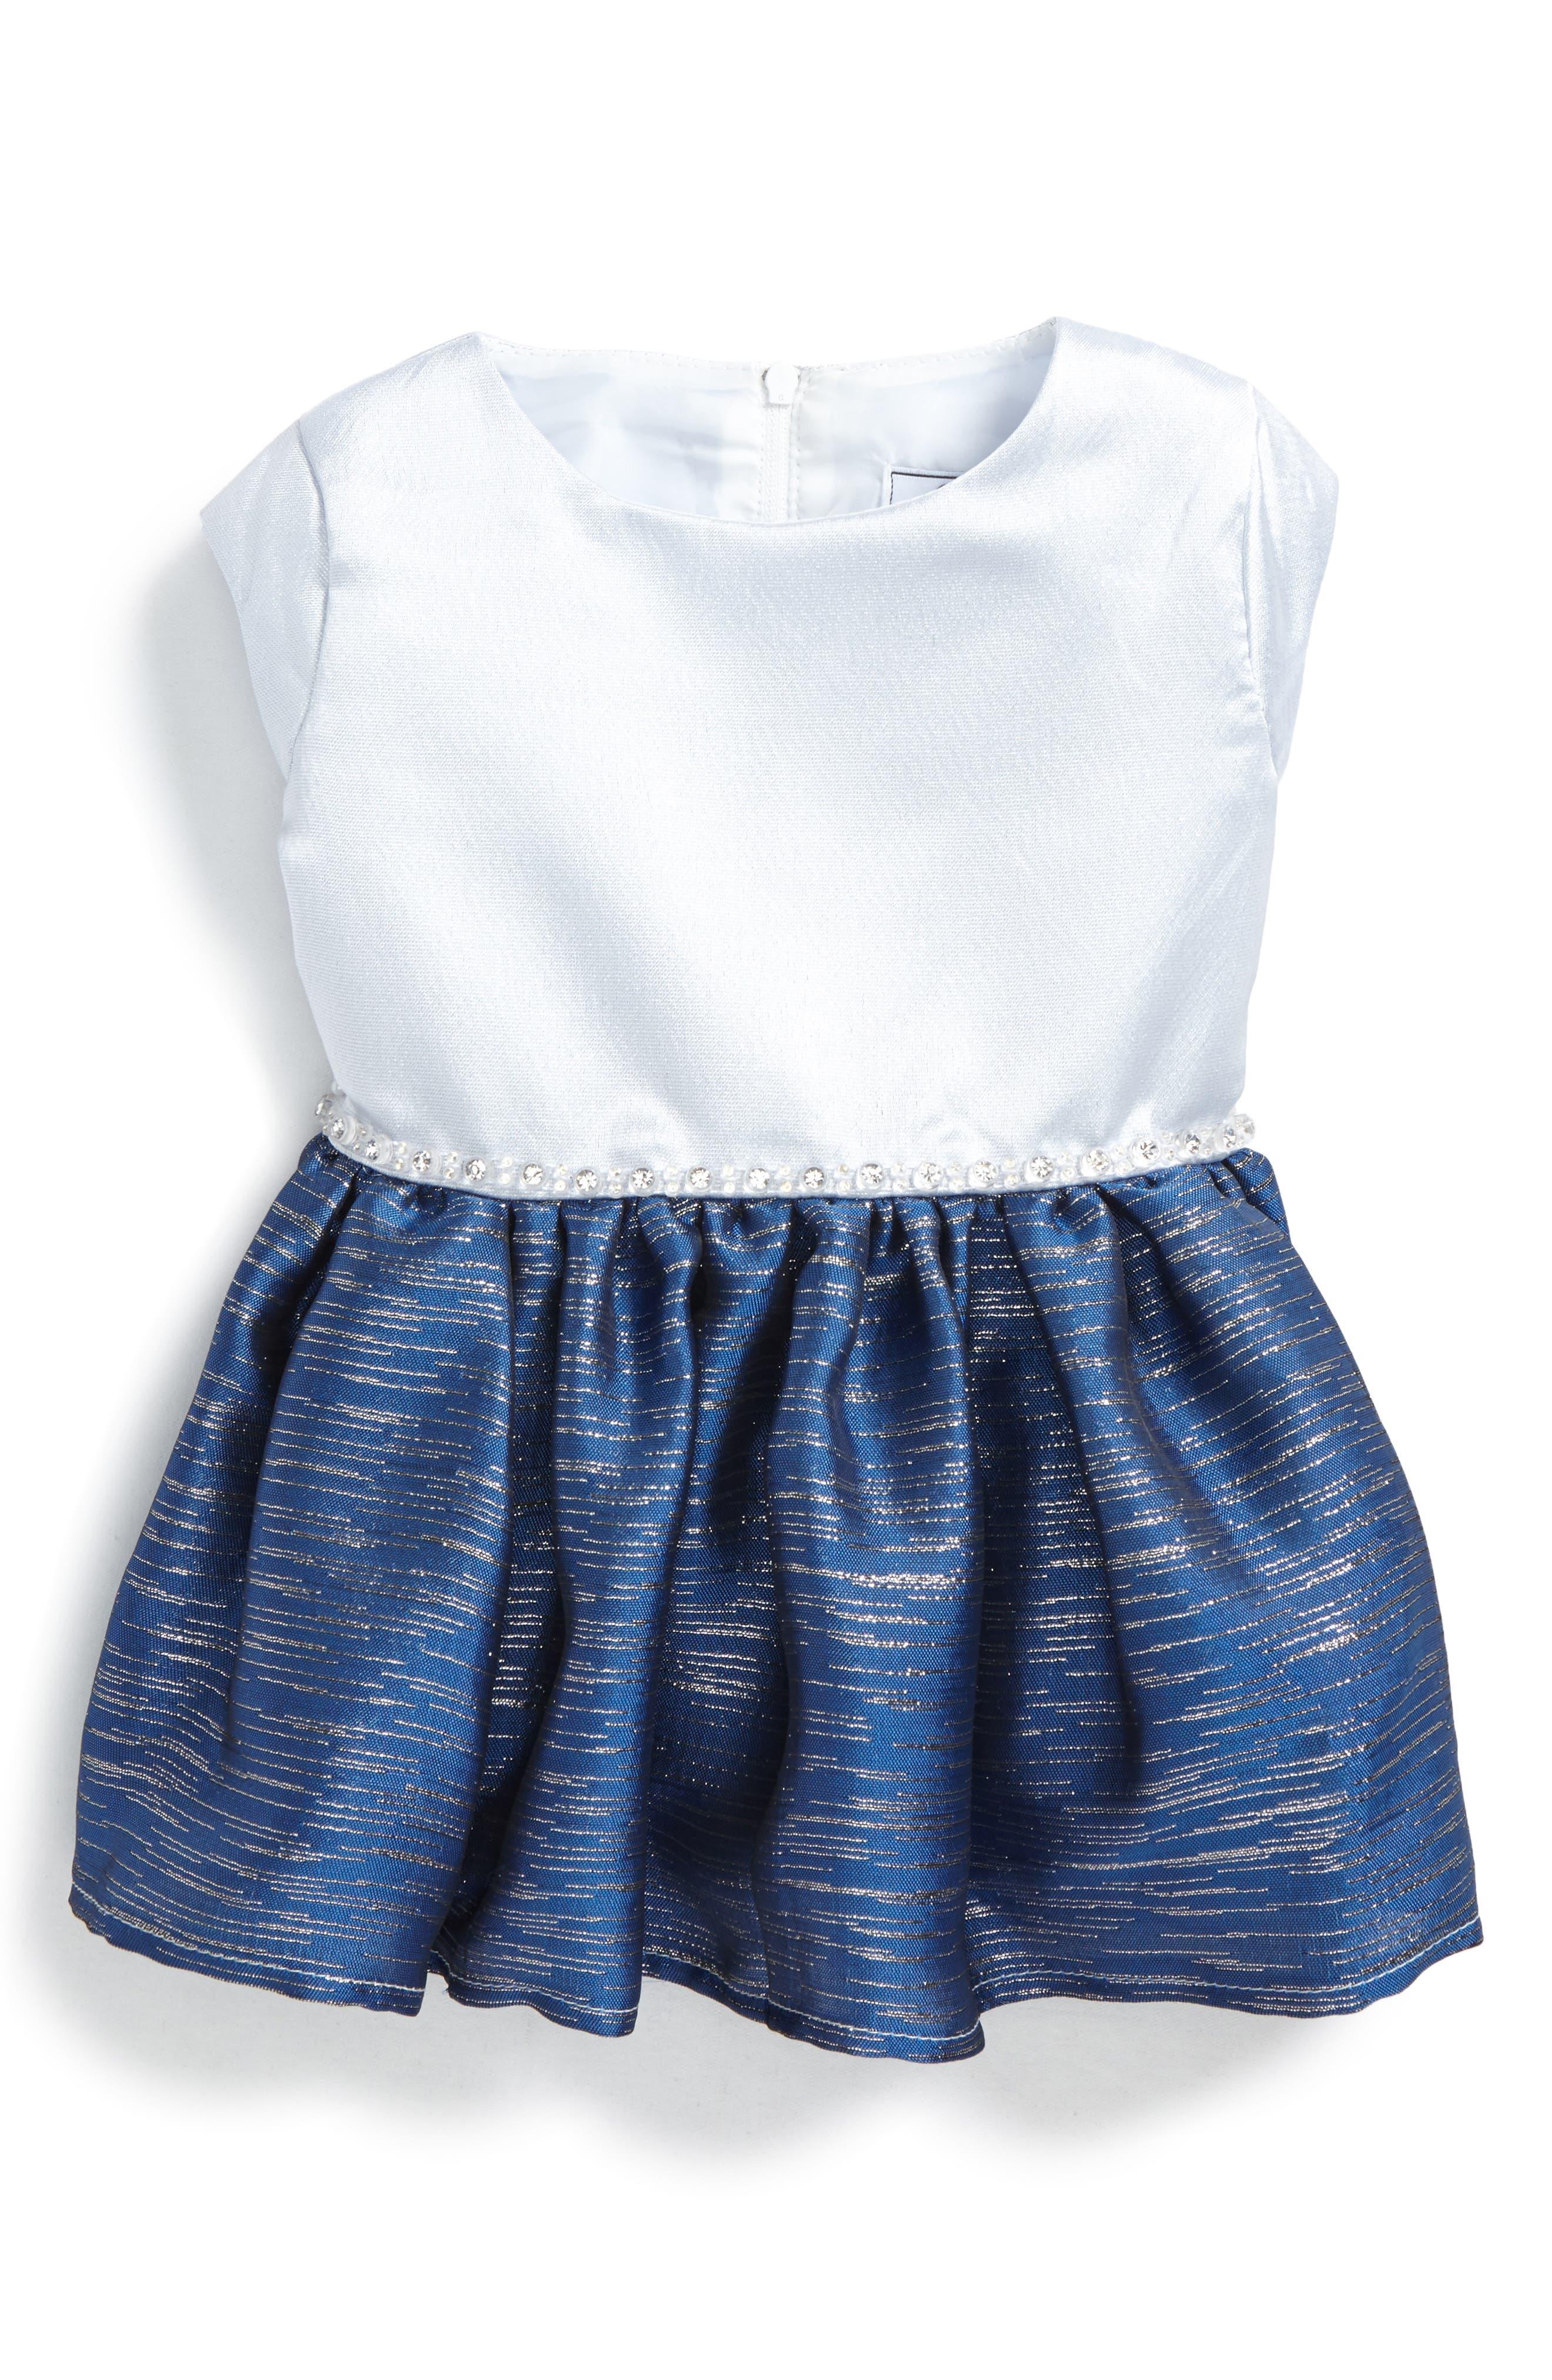 Alternate Image 1 Selected - Dorissa Jolie Fit & Flare Dress (Baby Girls)